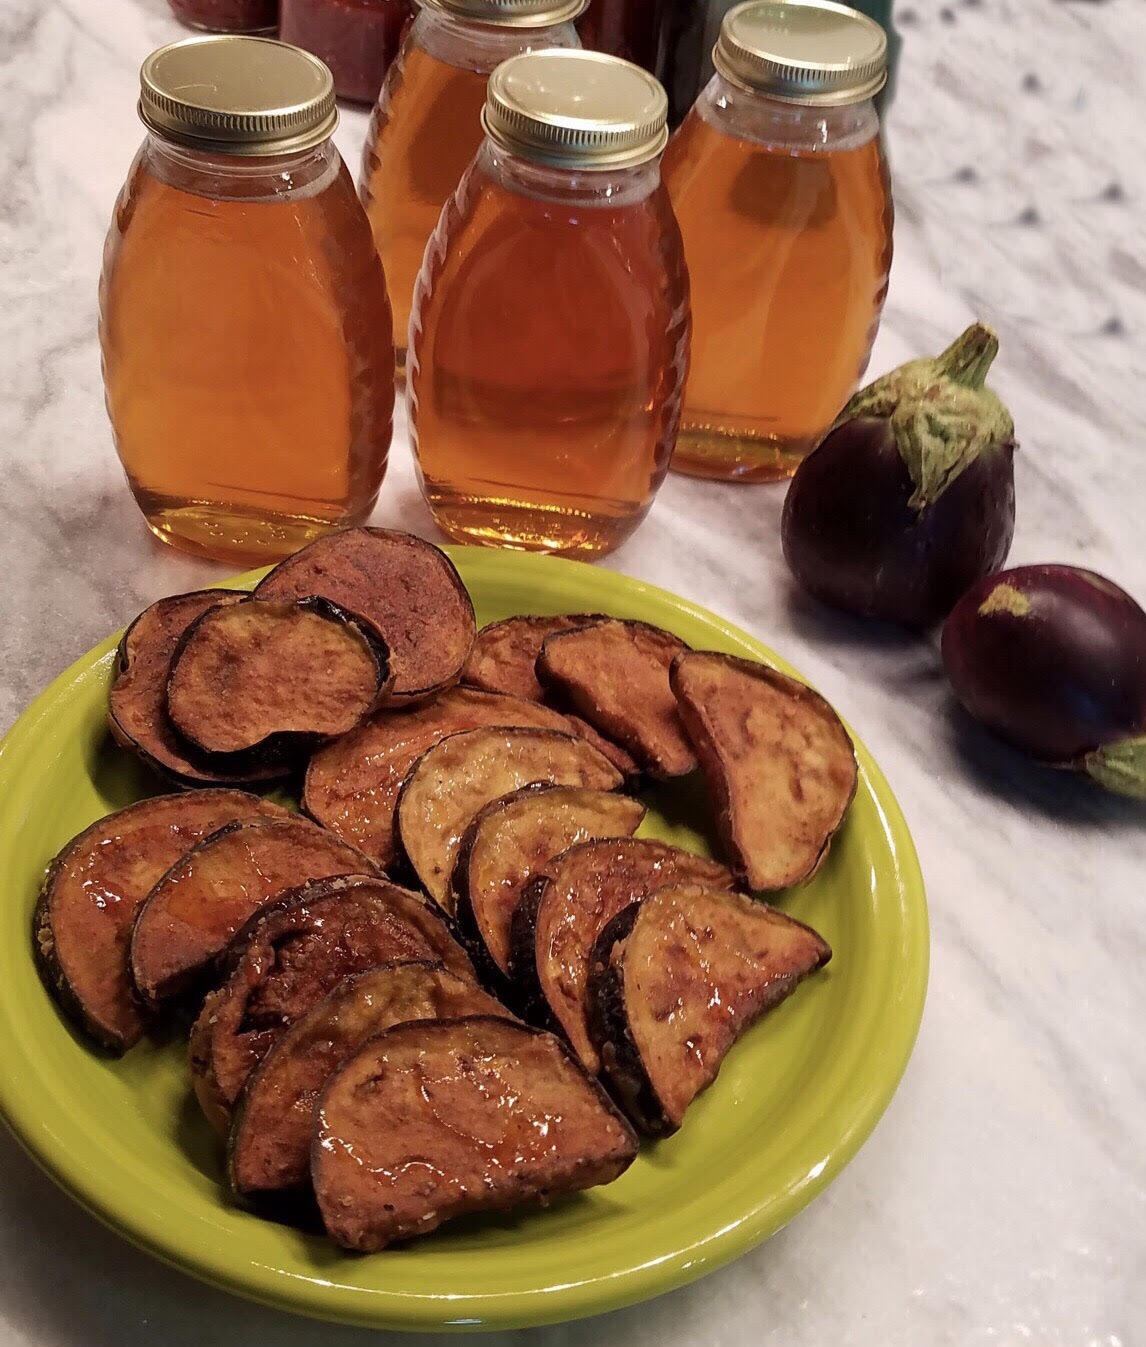 Berenjenas con Miel Eggplants with Honey